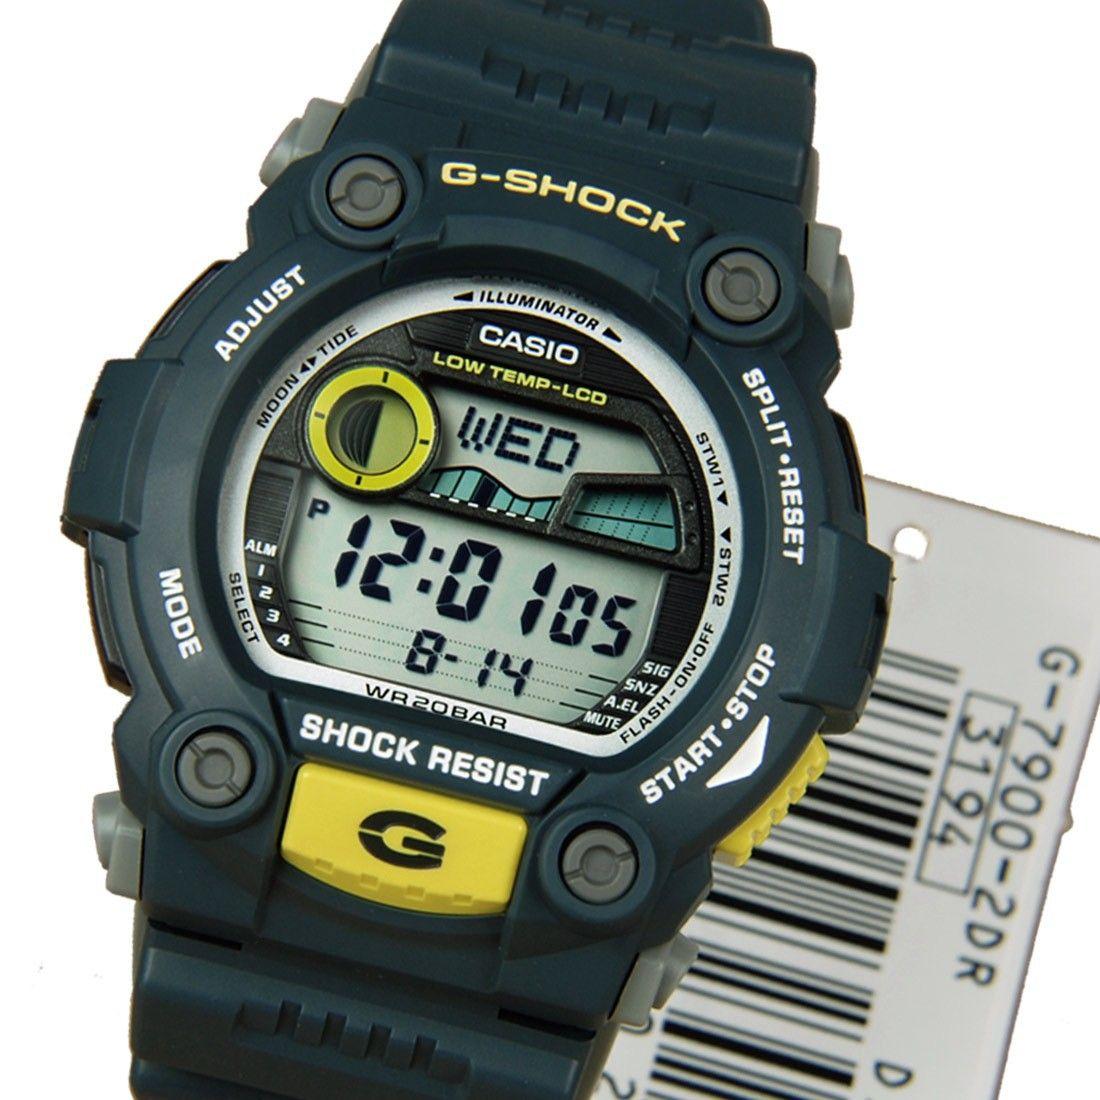 competitive price c2039 69cd5 Casio G_Shock Watch G-7900-2DR | seiko | Casio g shock ...